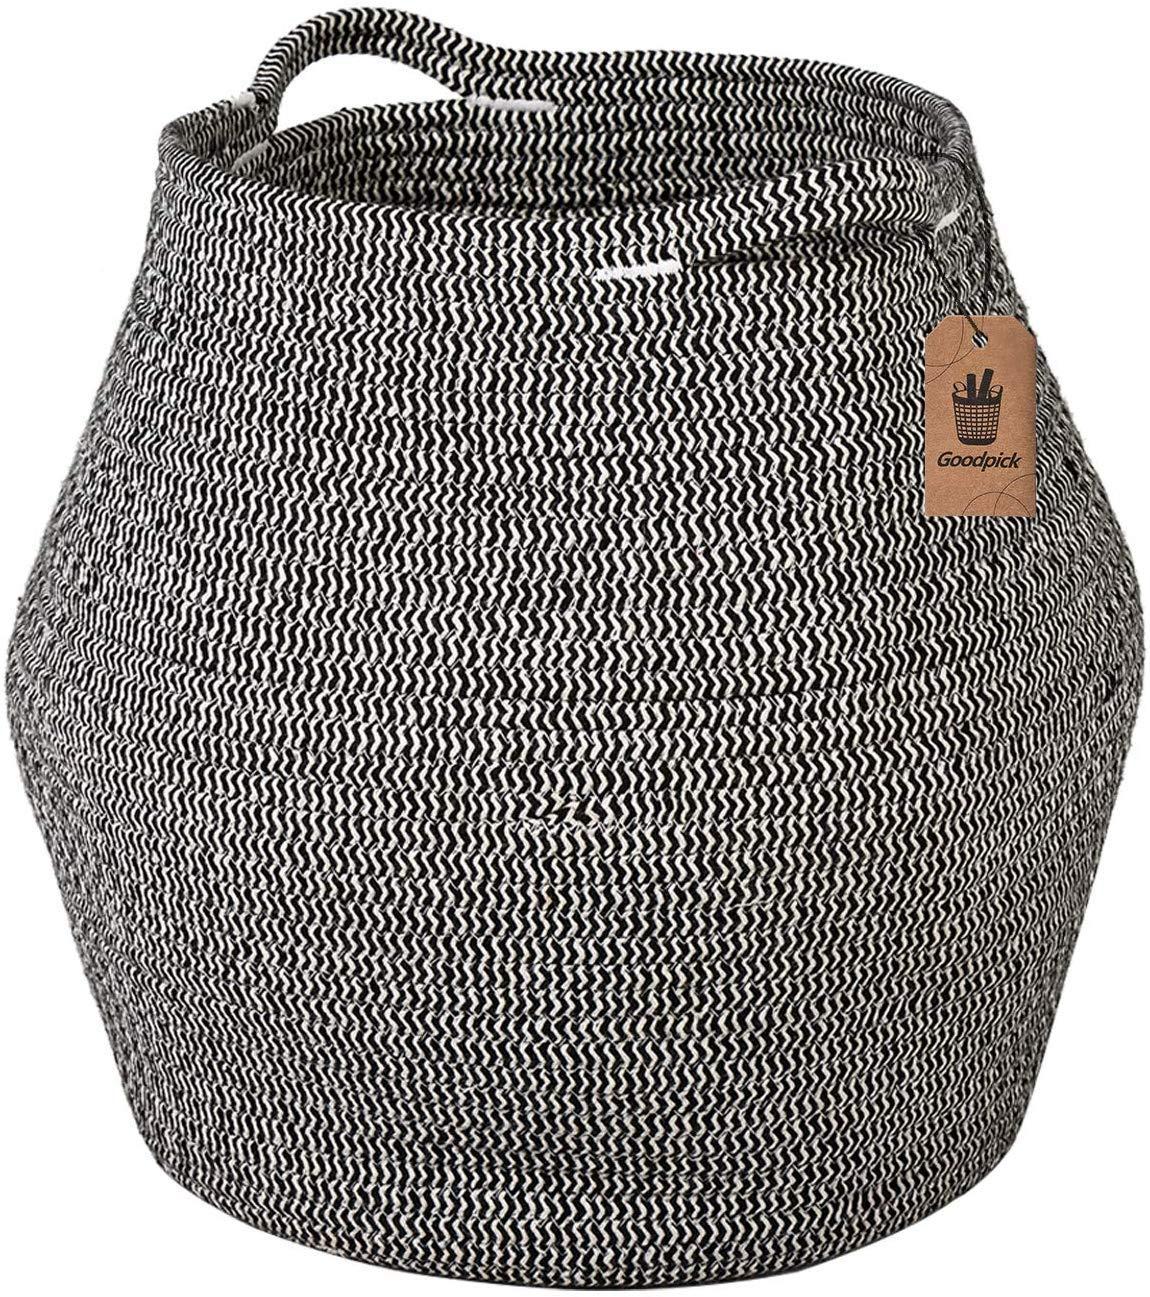 Goodpick Cotton Rope Storage Basket Woven Baby Laundry Basket for Storage, Plant Pot, Beach Bag, and Kids' Toys Home Decor Blanket Basket Planter Basket,16.1'' × 14.9 ''× 11.8''